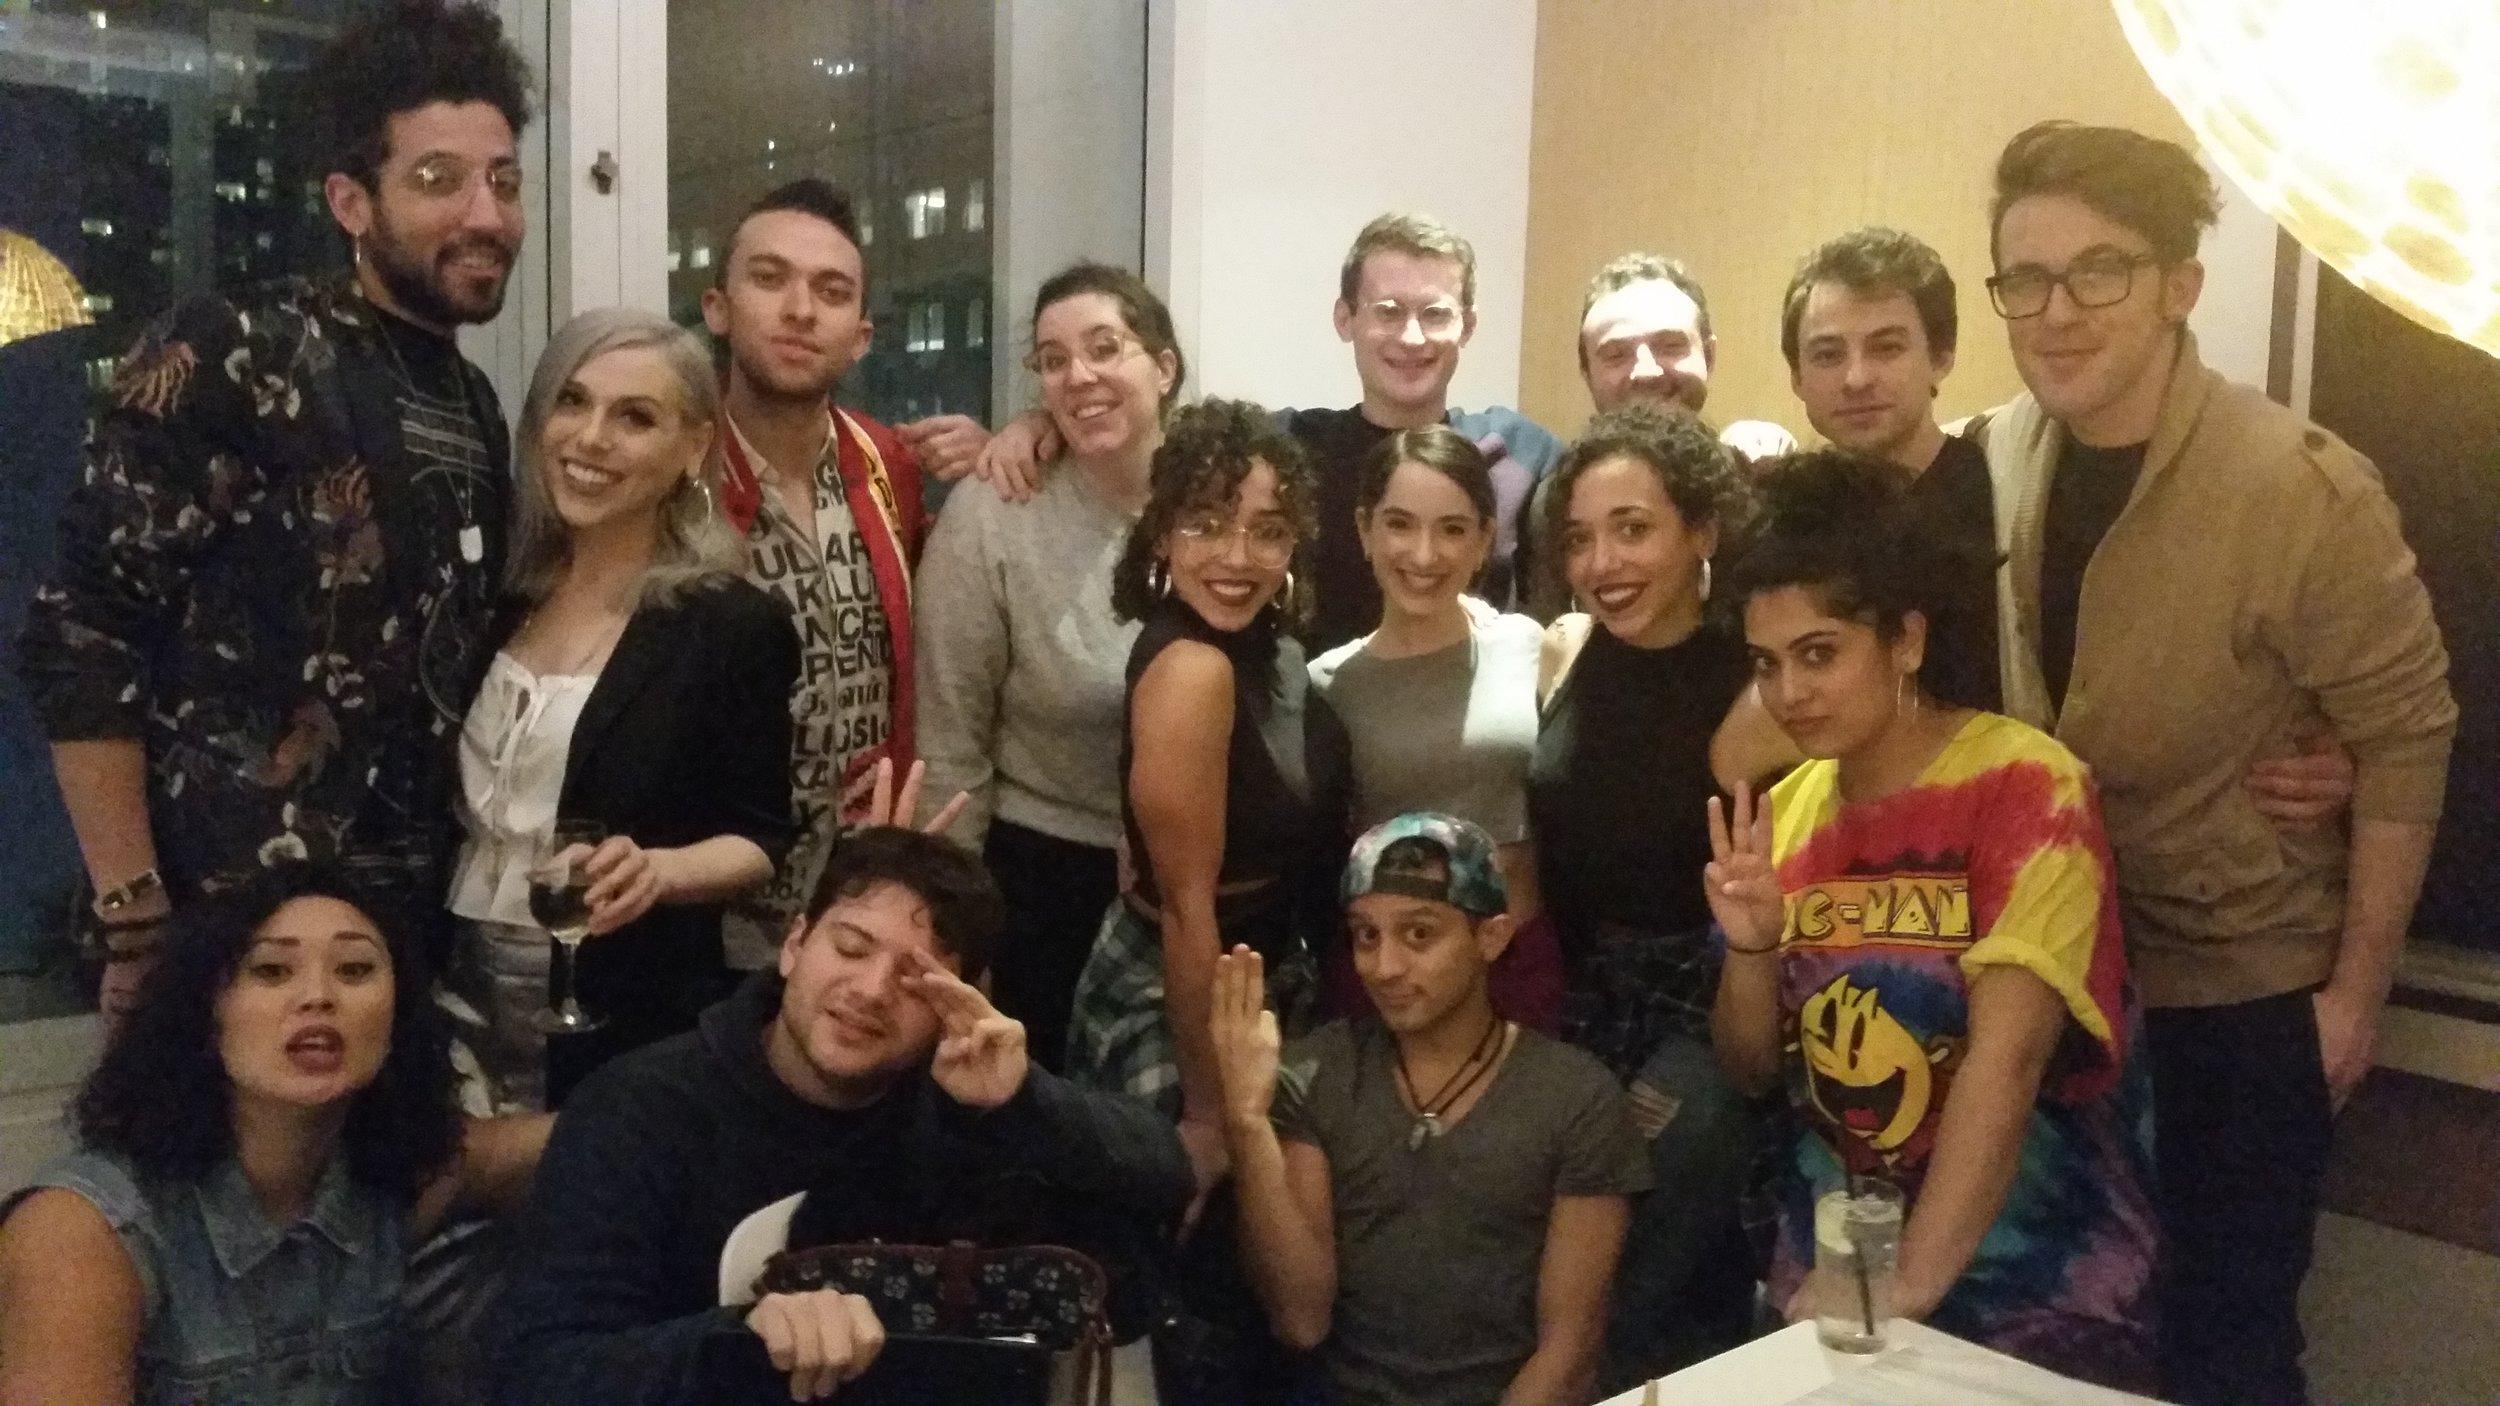 1key - 2018 November 25 - Story of Three - cast 2.jpg